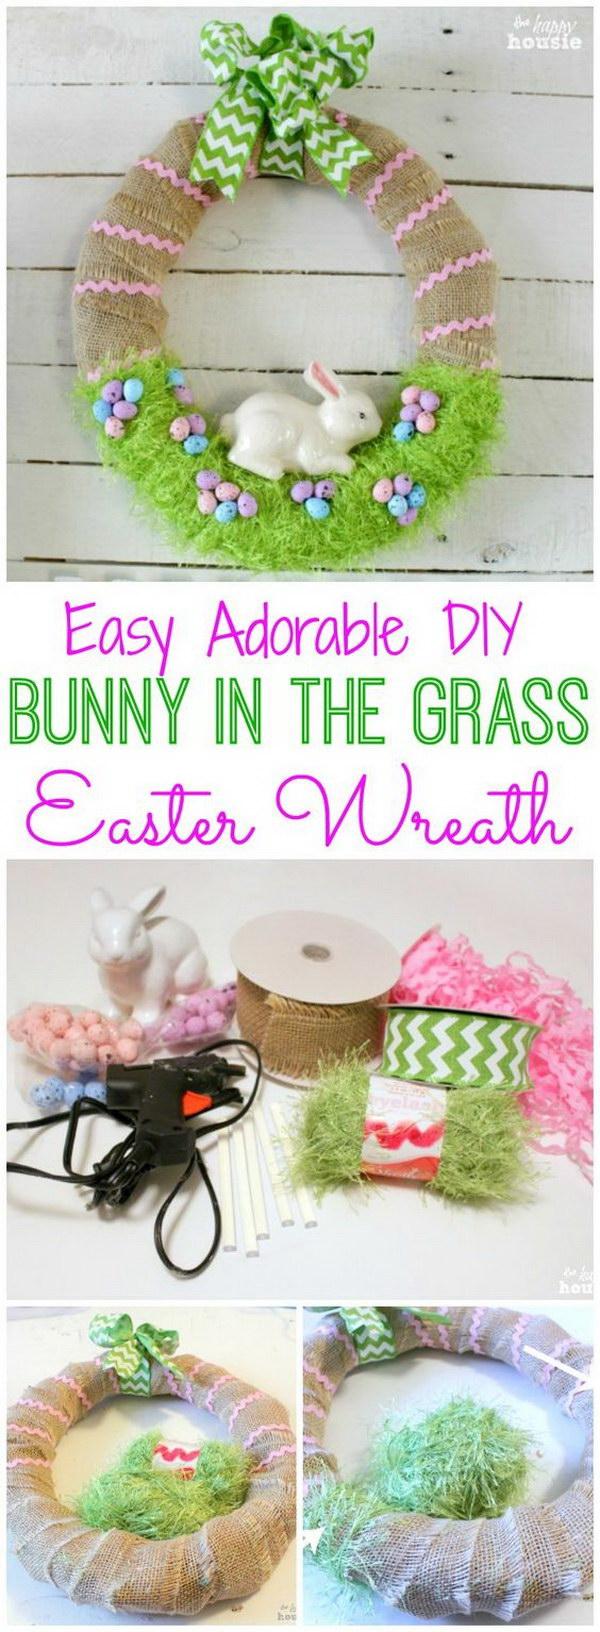 DIY Bunny in the Grass Wreath